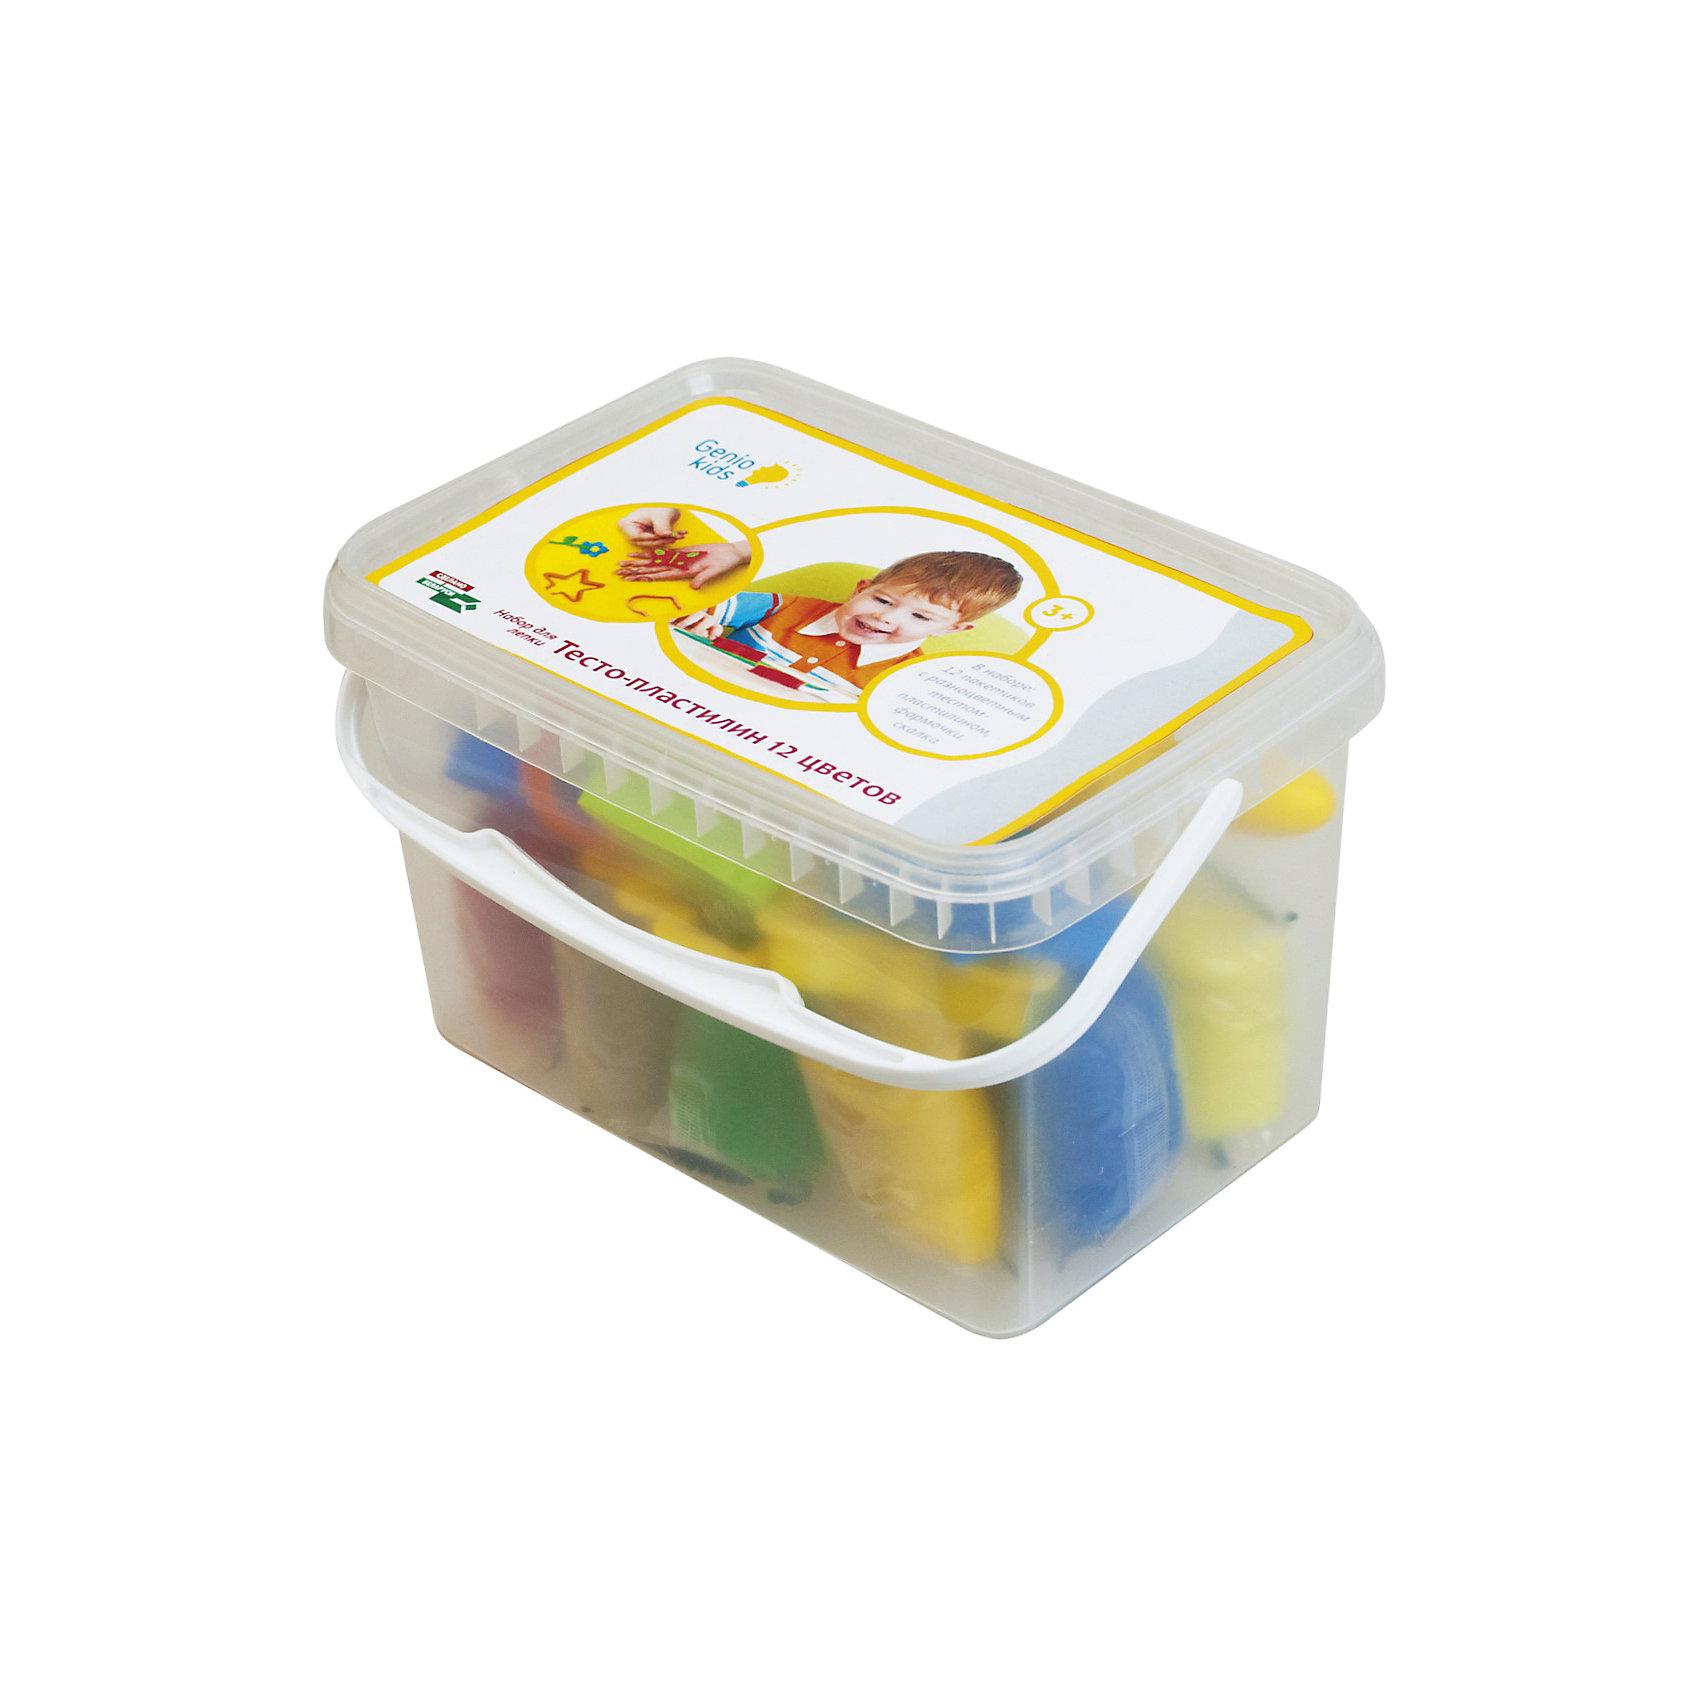 "Genio Kids Набор для детской лепки Тесто-пластилин 12 цветов genio kids набор для детского творчества ""шкатулка"""